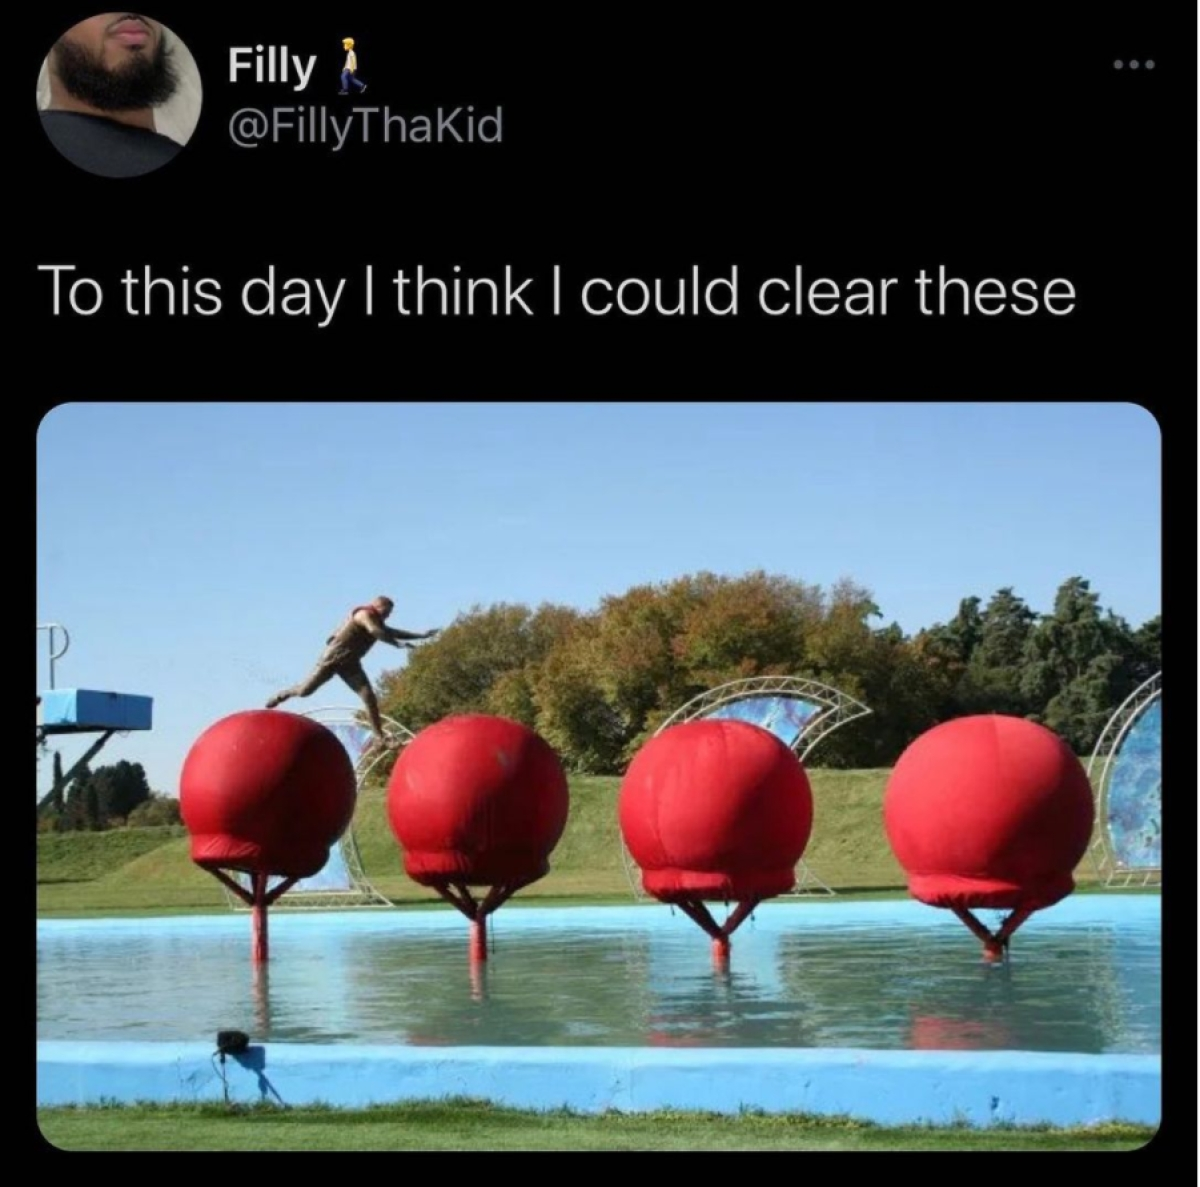 FPJ Fun Corner: Best WhatsApp jokes and memes to lighten your mood amid COVID-19 on December 17, 2020